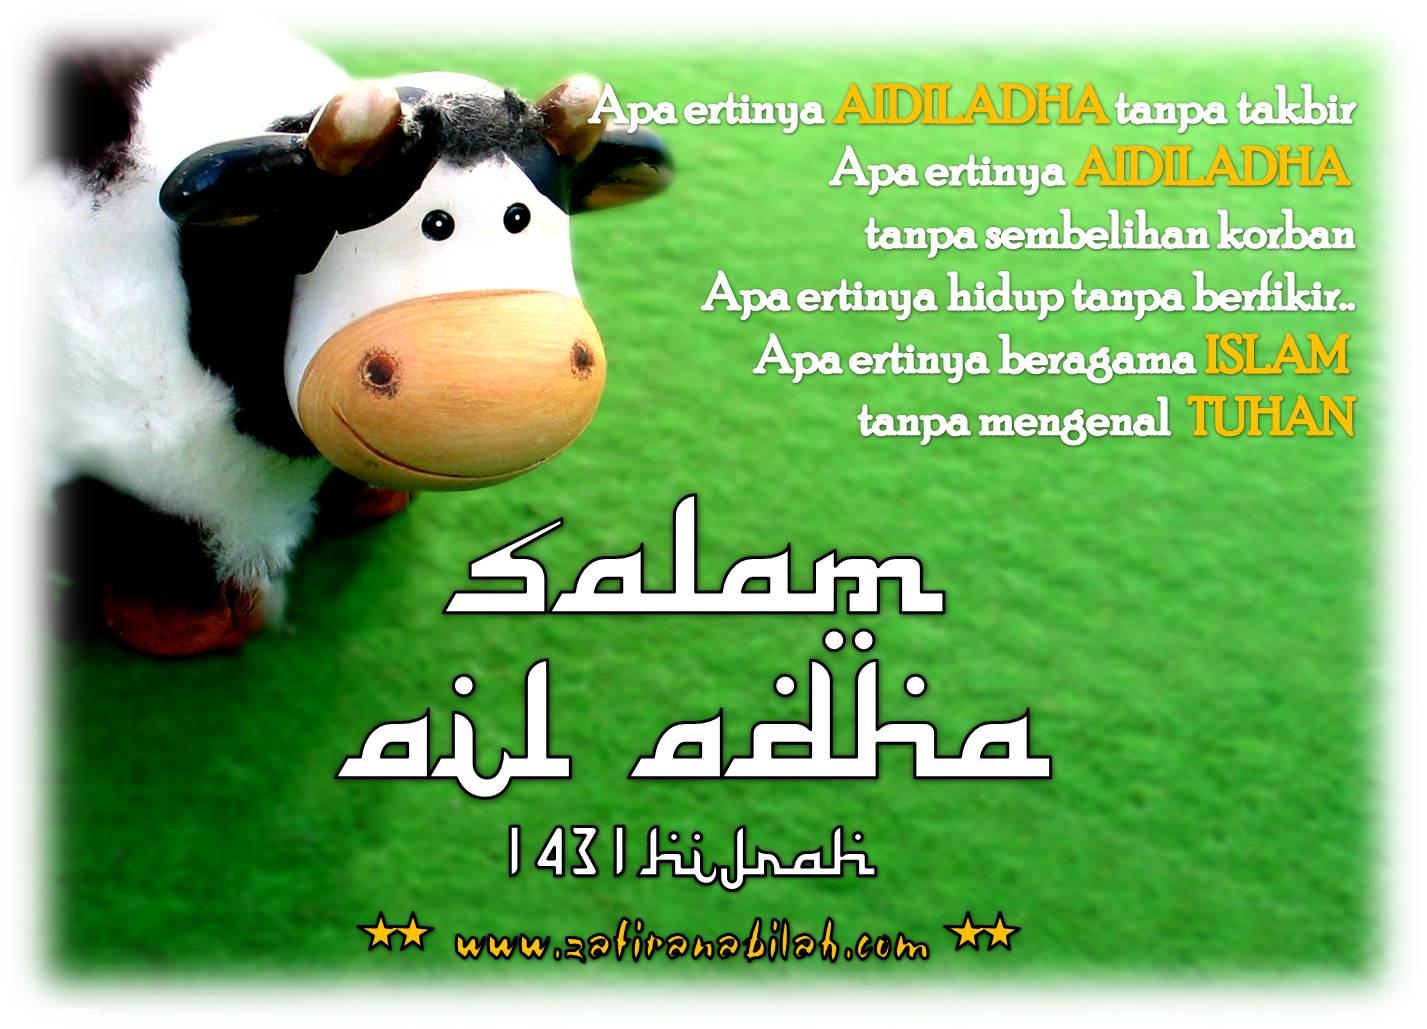 Salam aidiladha 2015 hd wallpapers images free download online also visit selamat hari raya idil fitri 2015 puasa wishes kristyandbryce Images